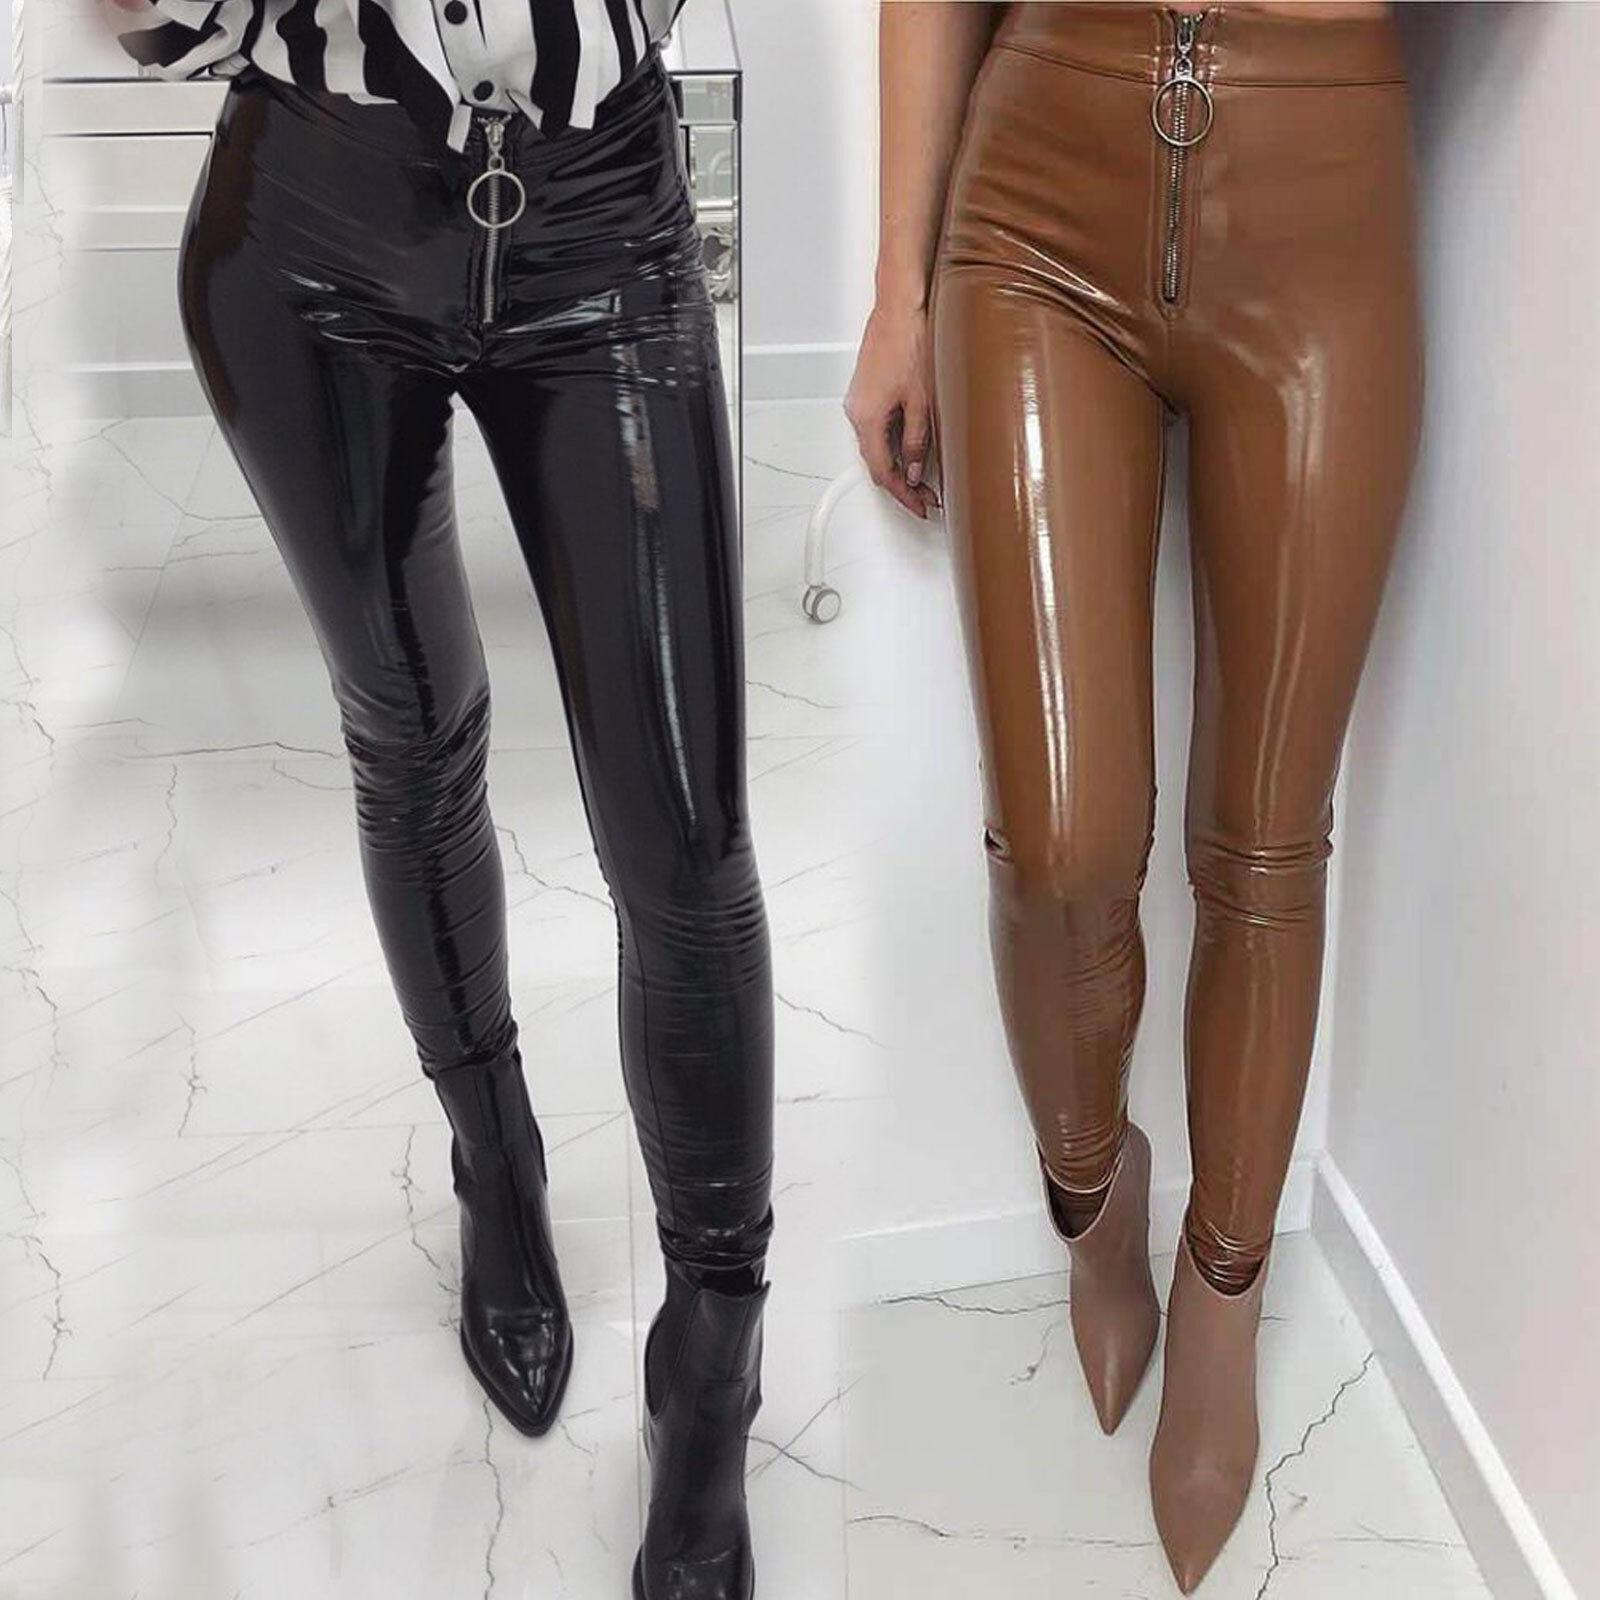 La Pantalon Femme lackhose Röhrenhose verni wetlook vinyl Pantalon Glossy camel XS-L